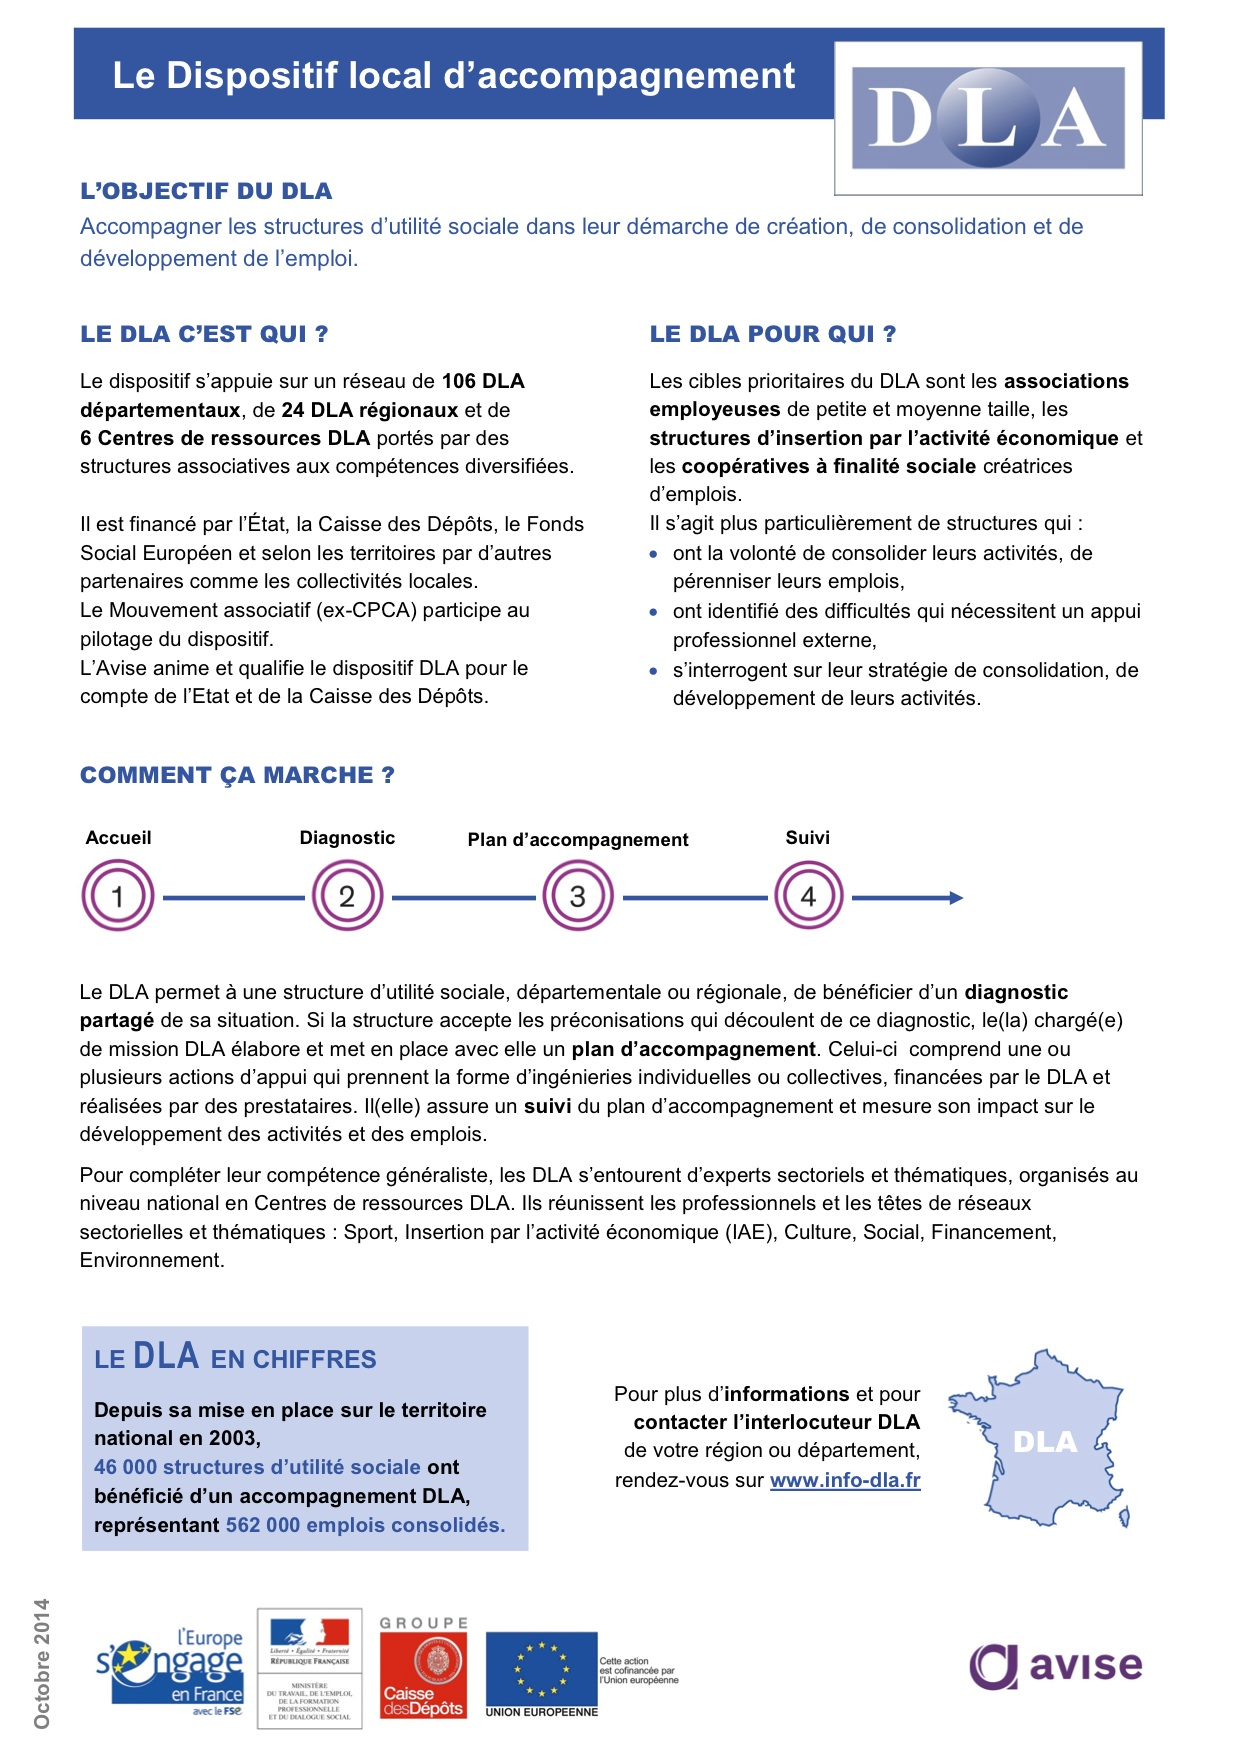 avise_fiche-promo-dla-v1.jpg